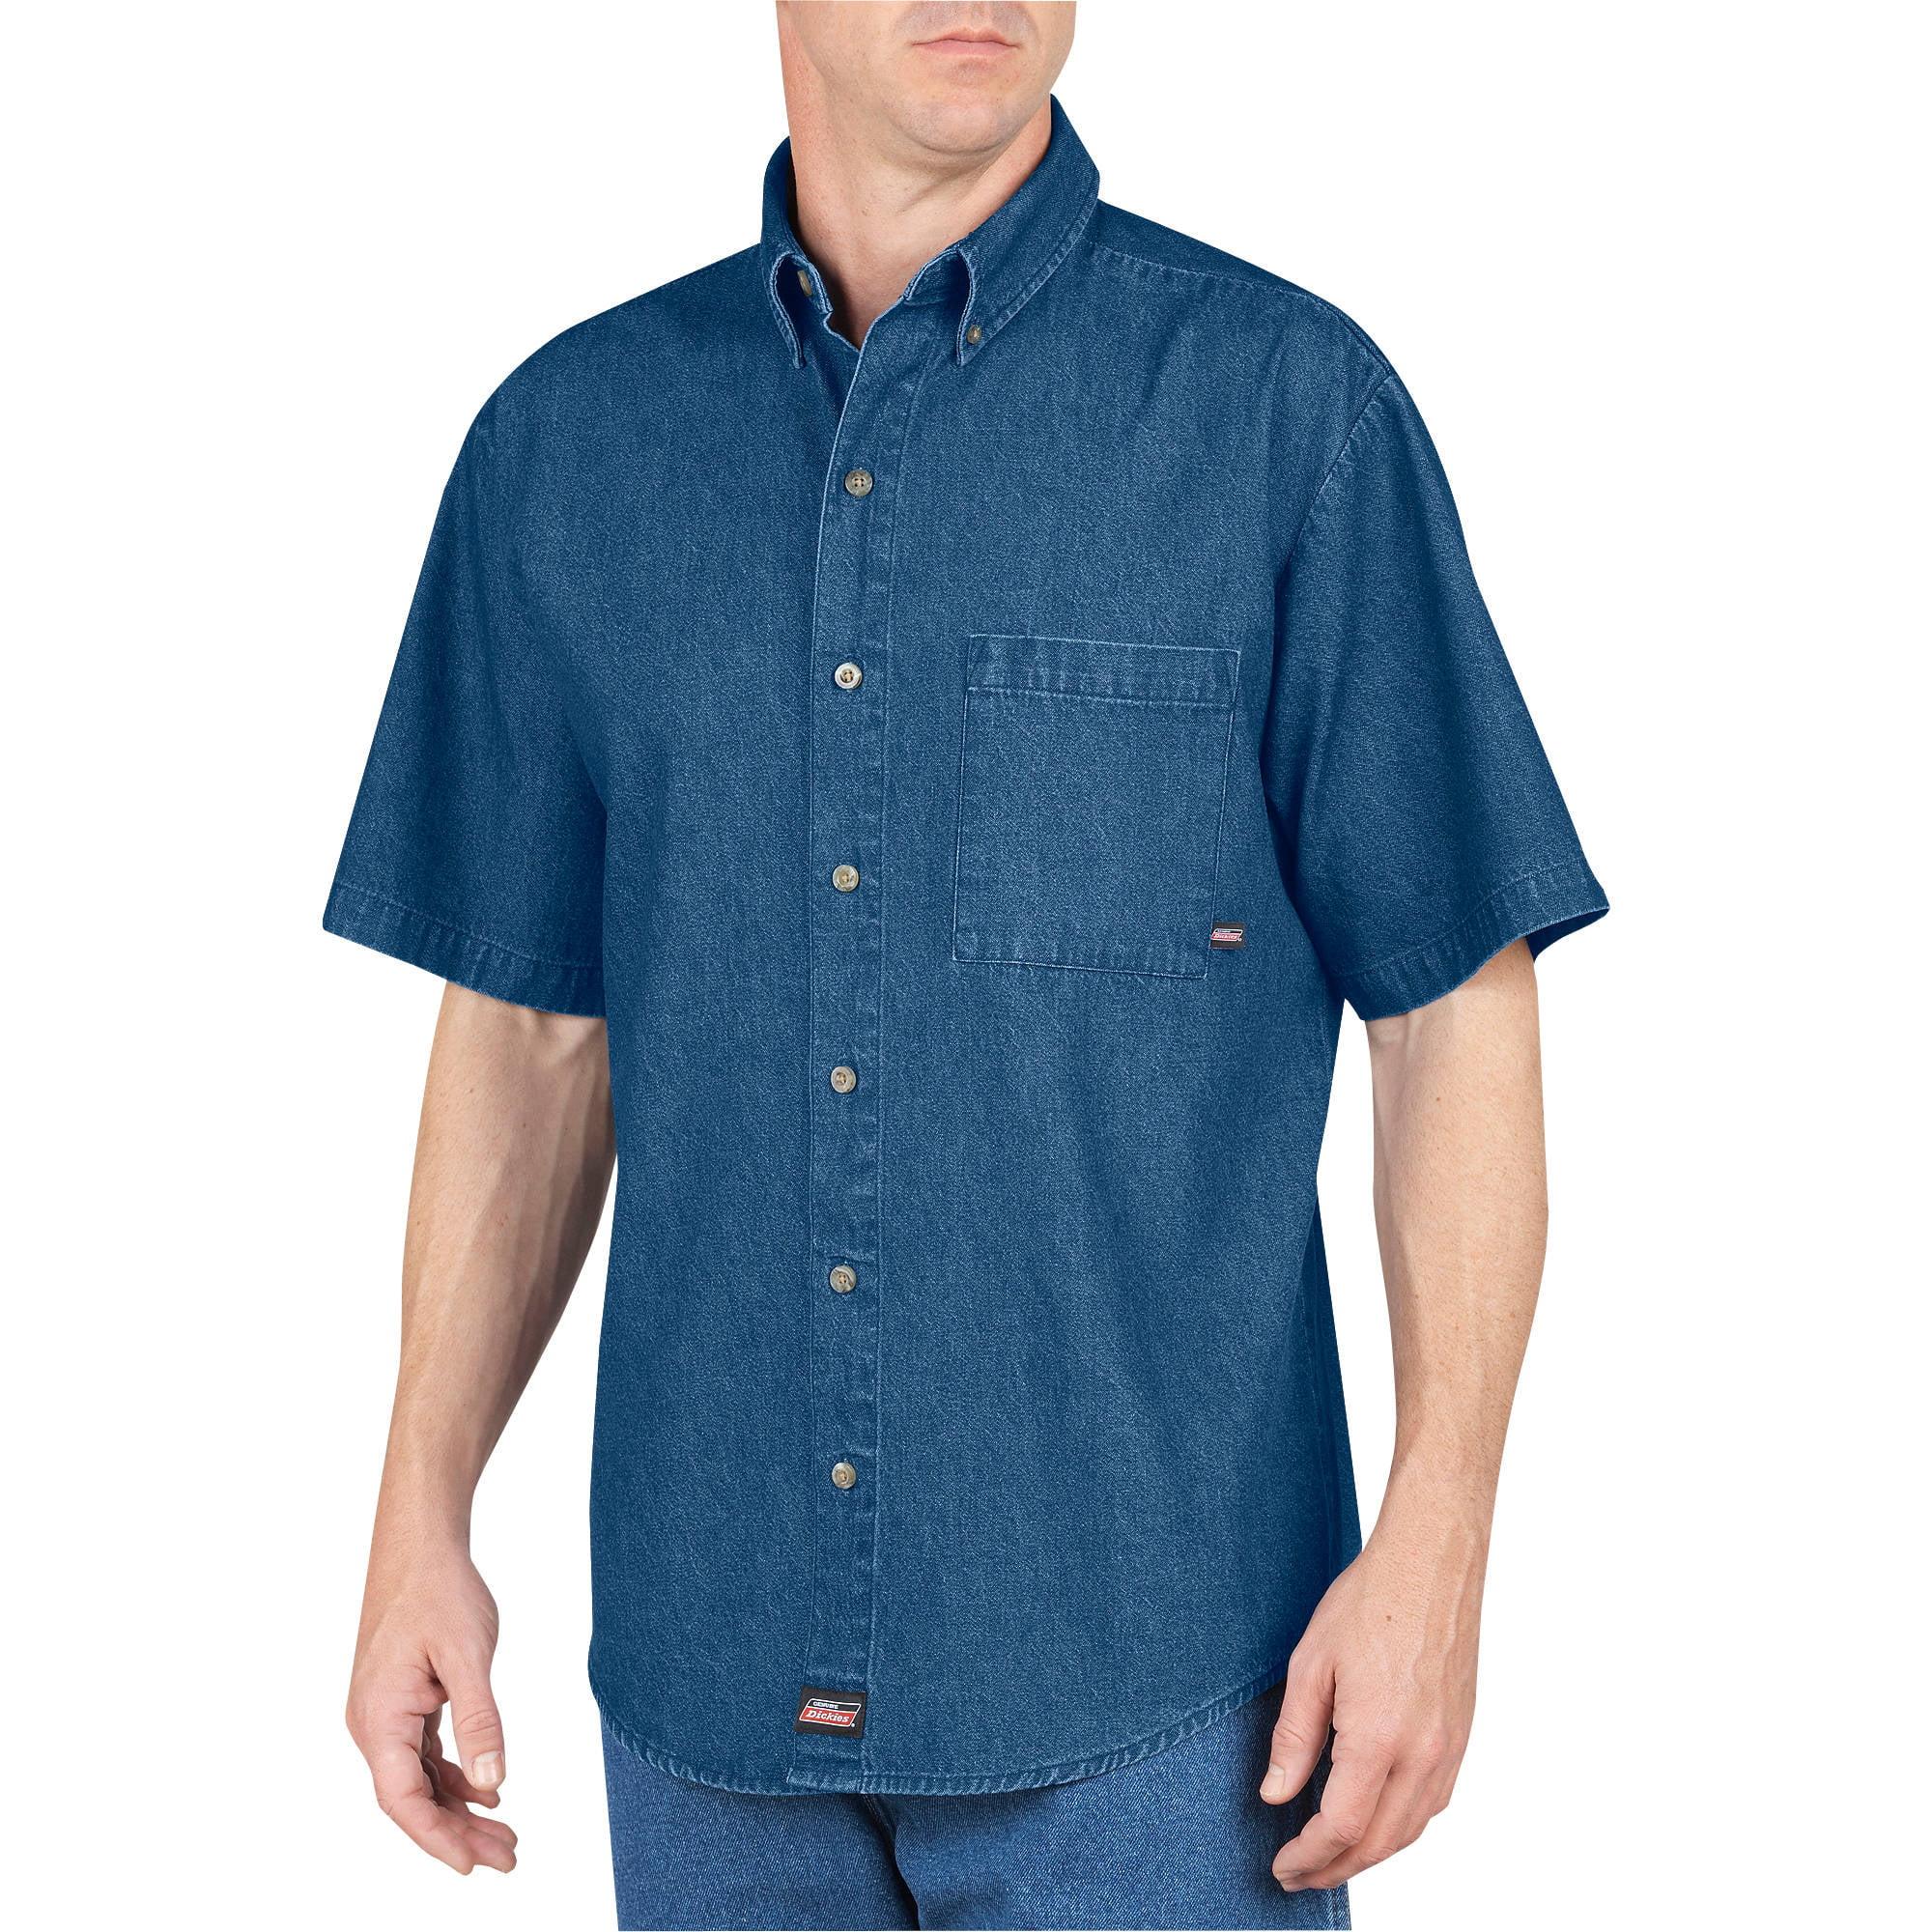 Genuine Dickies Big Men's Short Sleeve Denim Shirt